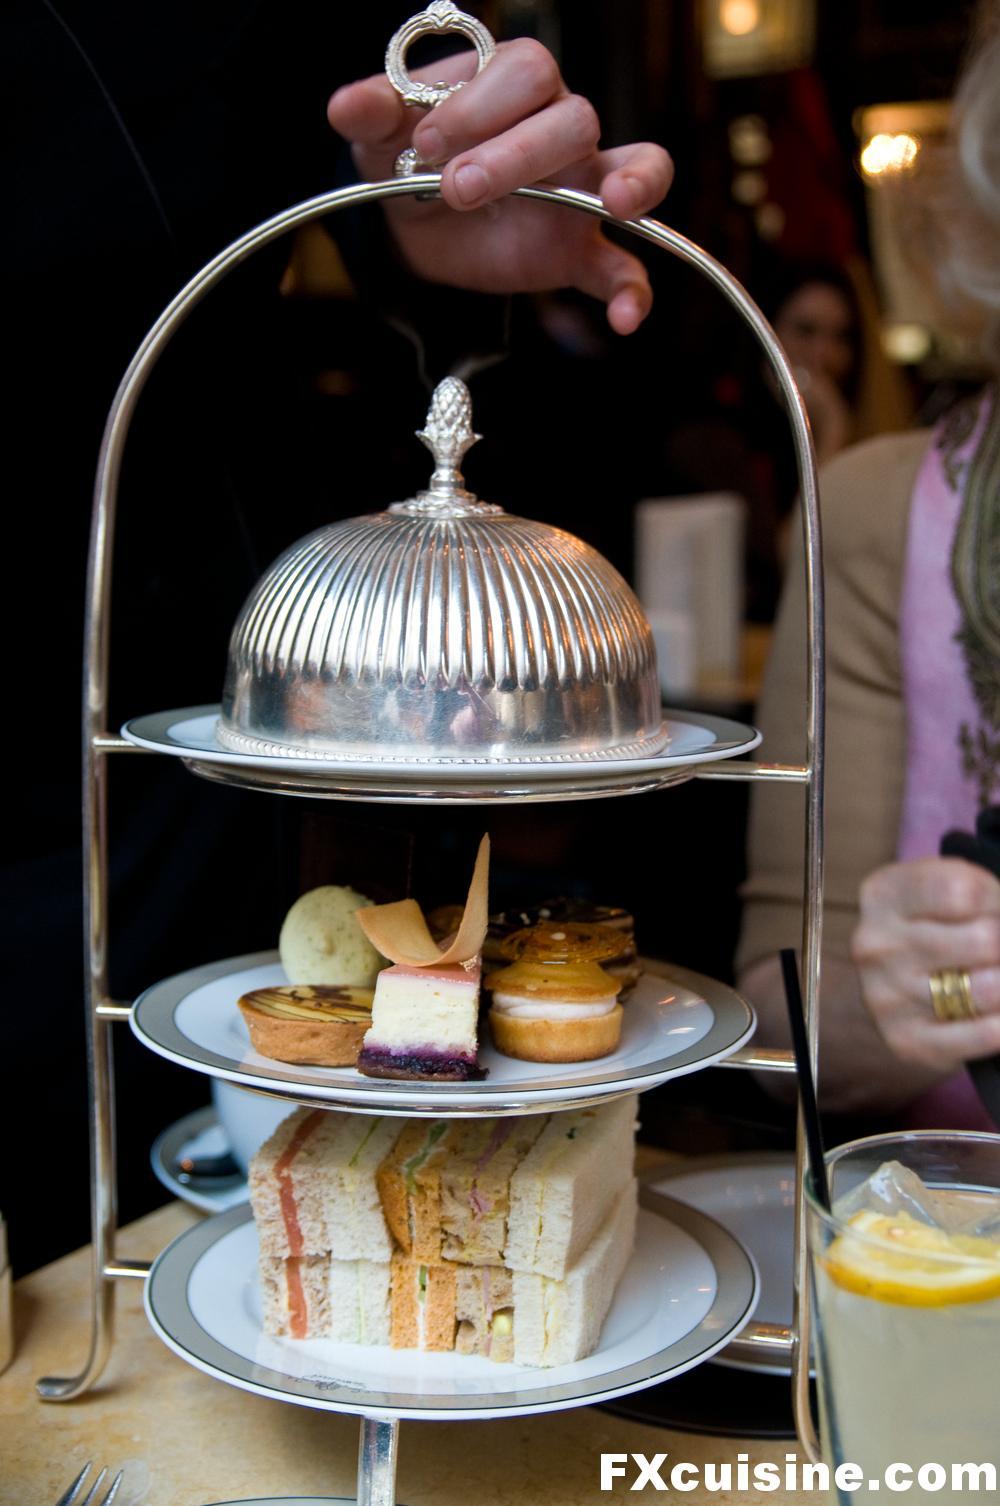 "Back to article '<p><a href=""http://fxcuisine.com/zoom-image.asp?image=http://fxcuisine.com/blogimages/british-cuisine/london-tea/tea-with-sir-hugh-03-1000.jpg&t=%%t%%""><img src=""http://fxcuisine.com/blogimages/britis'"